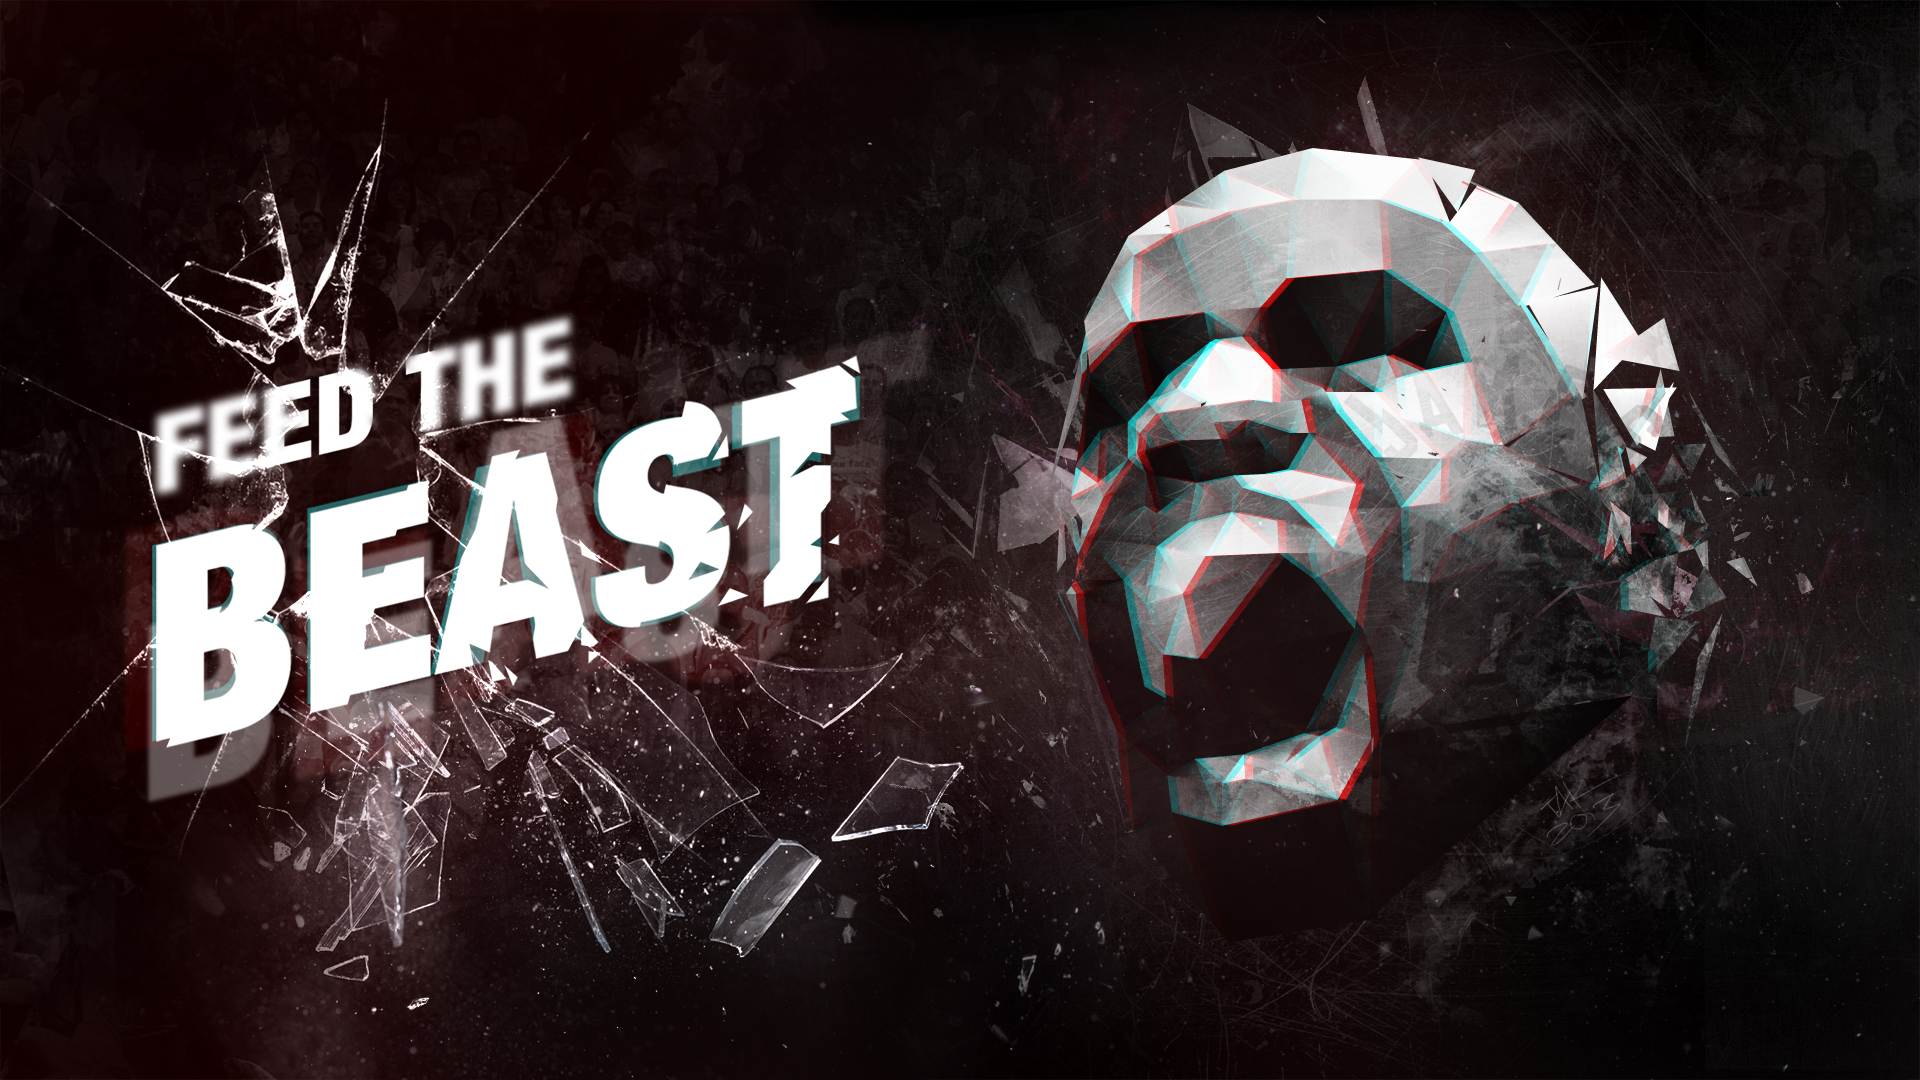 LeBron James Feed The Beast Wallpaper Posterizes NBA 1920x1080